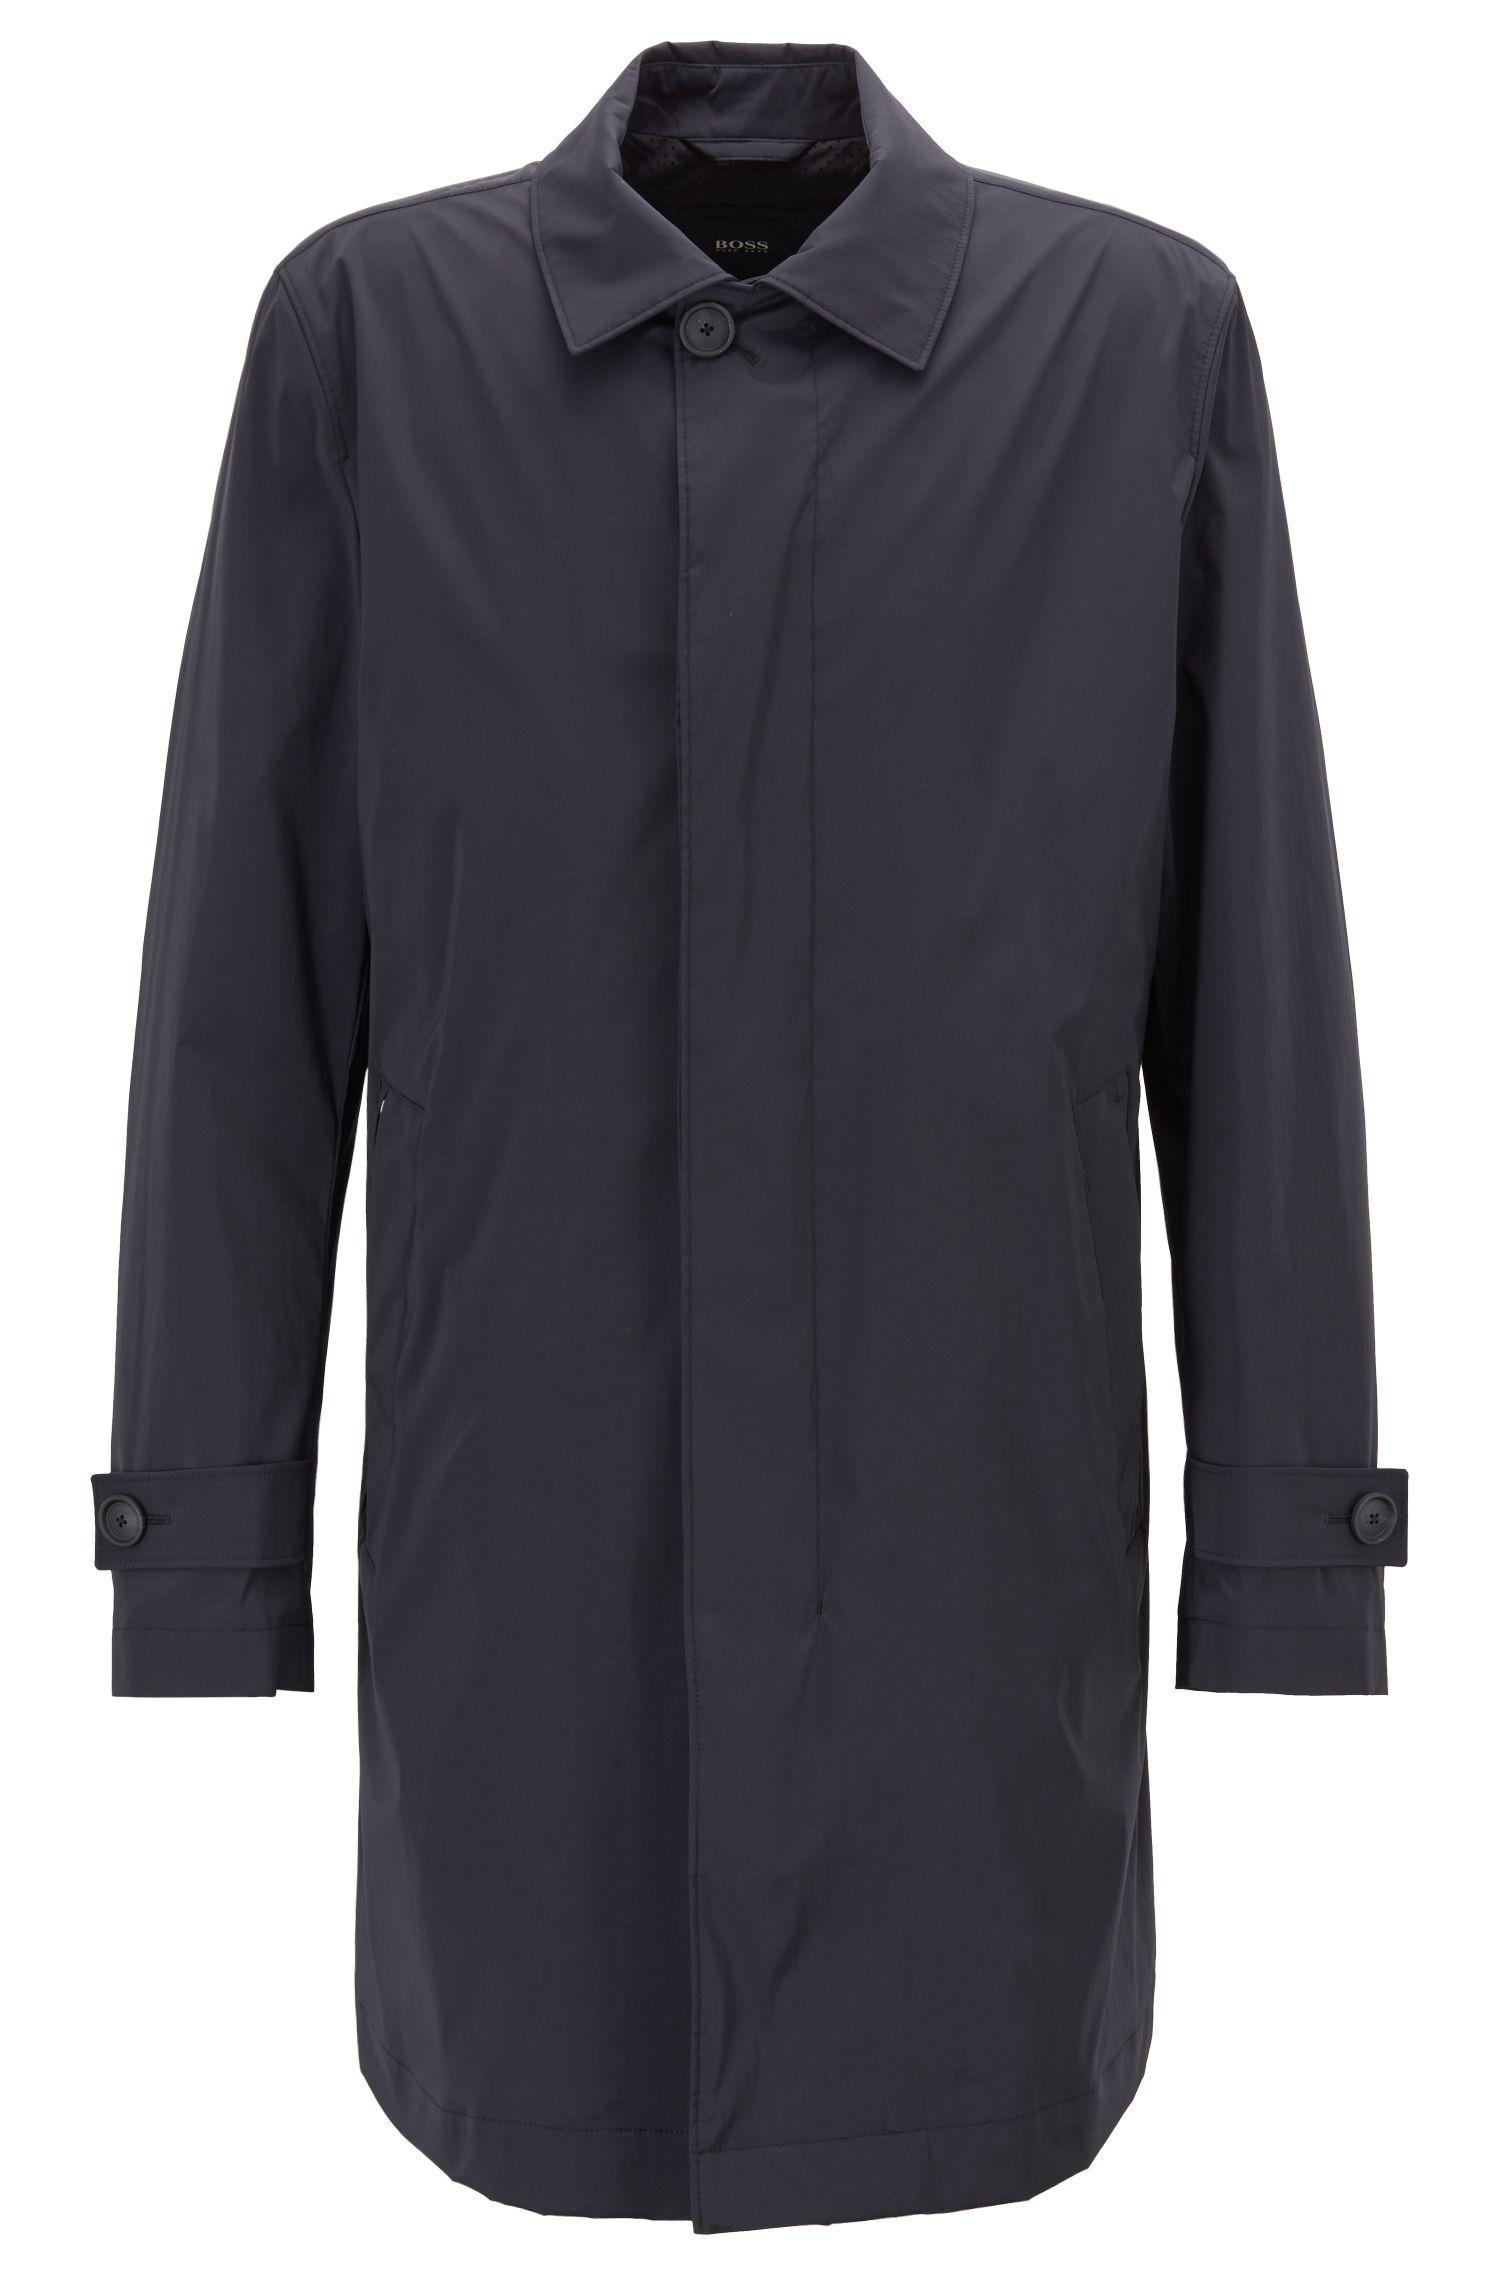 Manteau carcoat long en tissu stretch, Noir